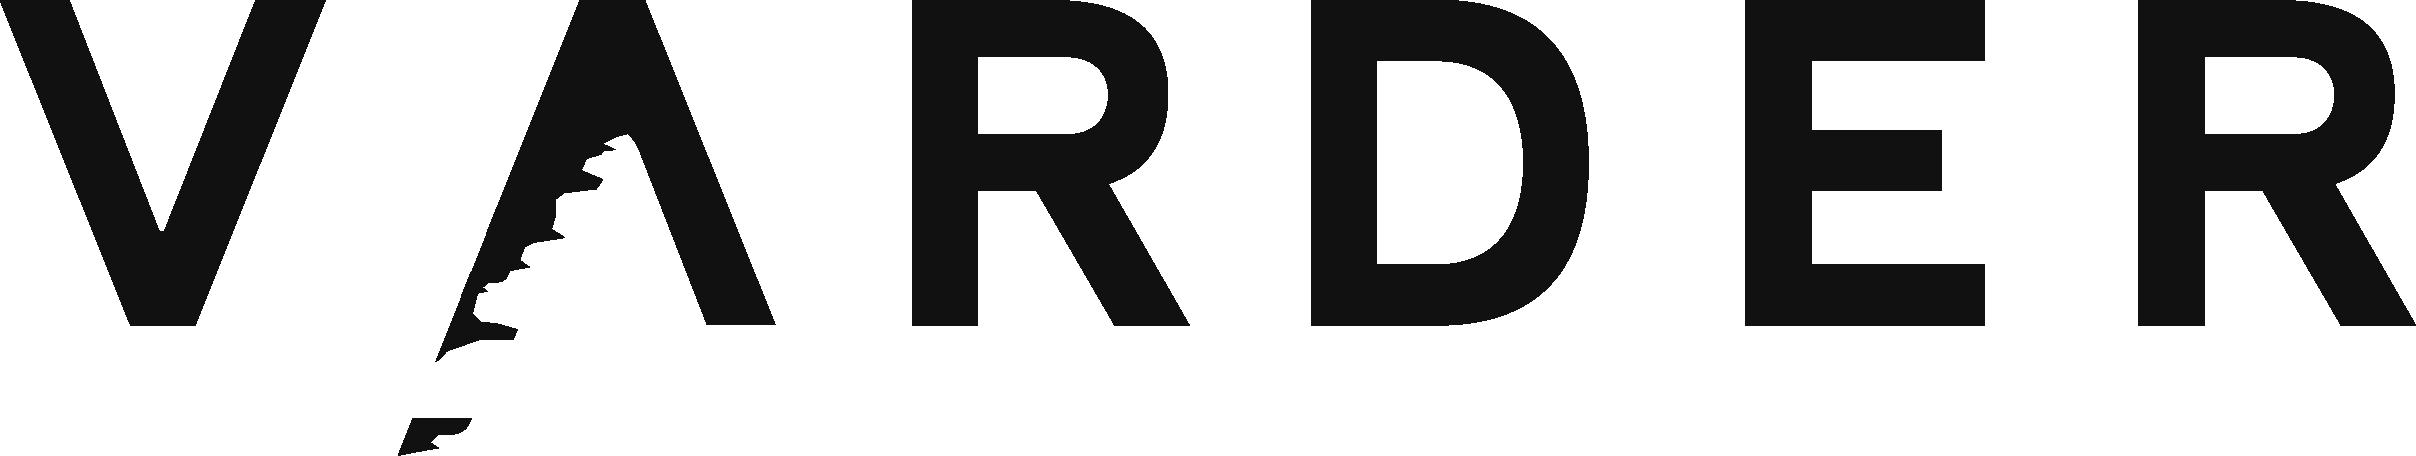 Varder logo sort